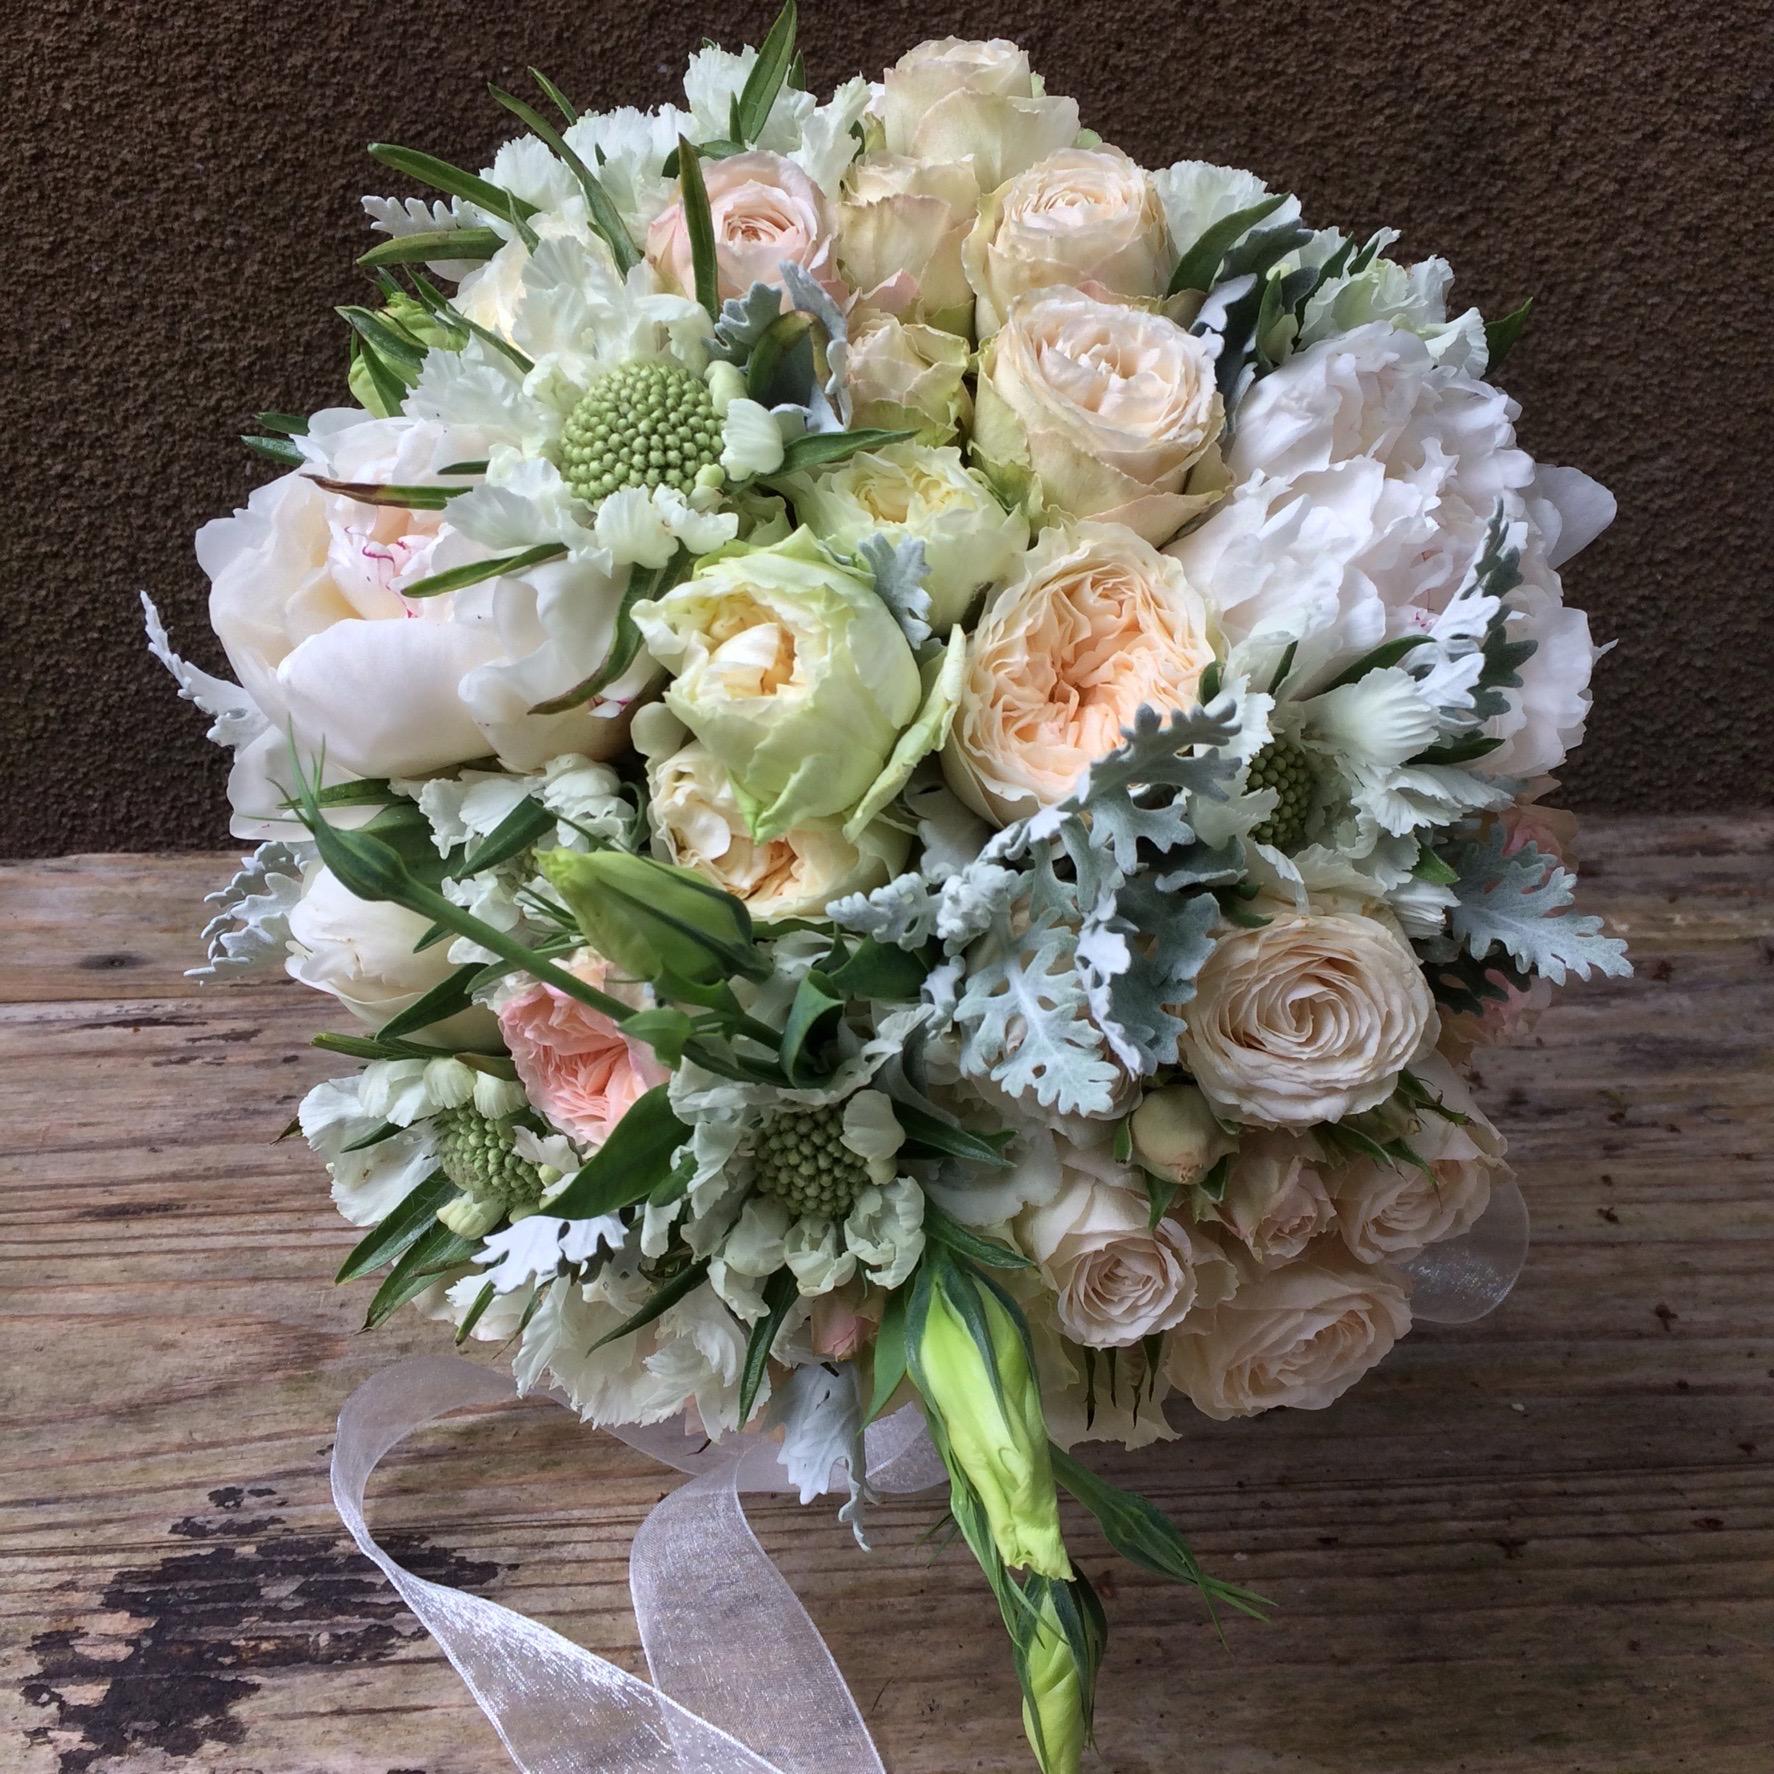 Bridal bouquet, DavidAusten:Peoony:Scabiosa.jpeg